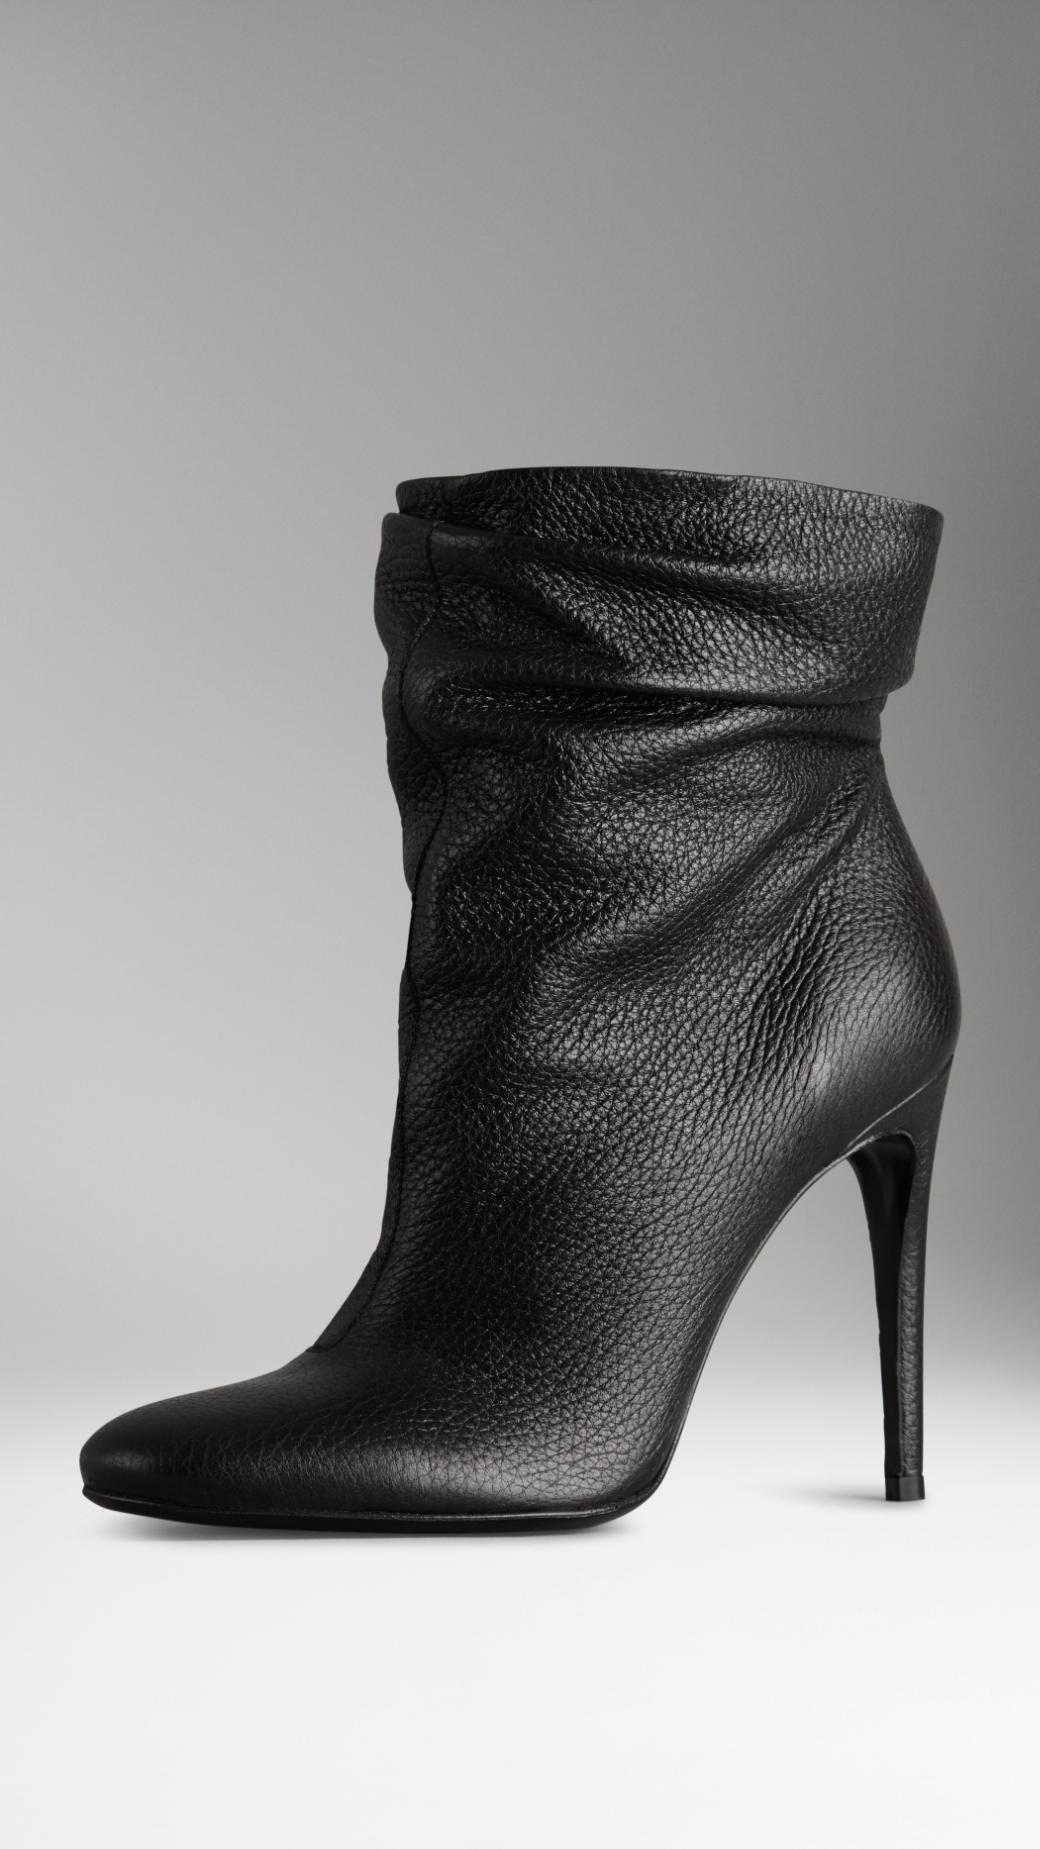 Burberry Deerskin Ankle Boots in Black   Lyst